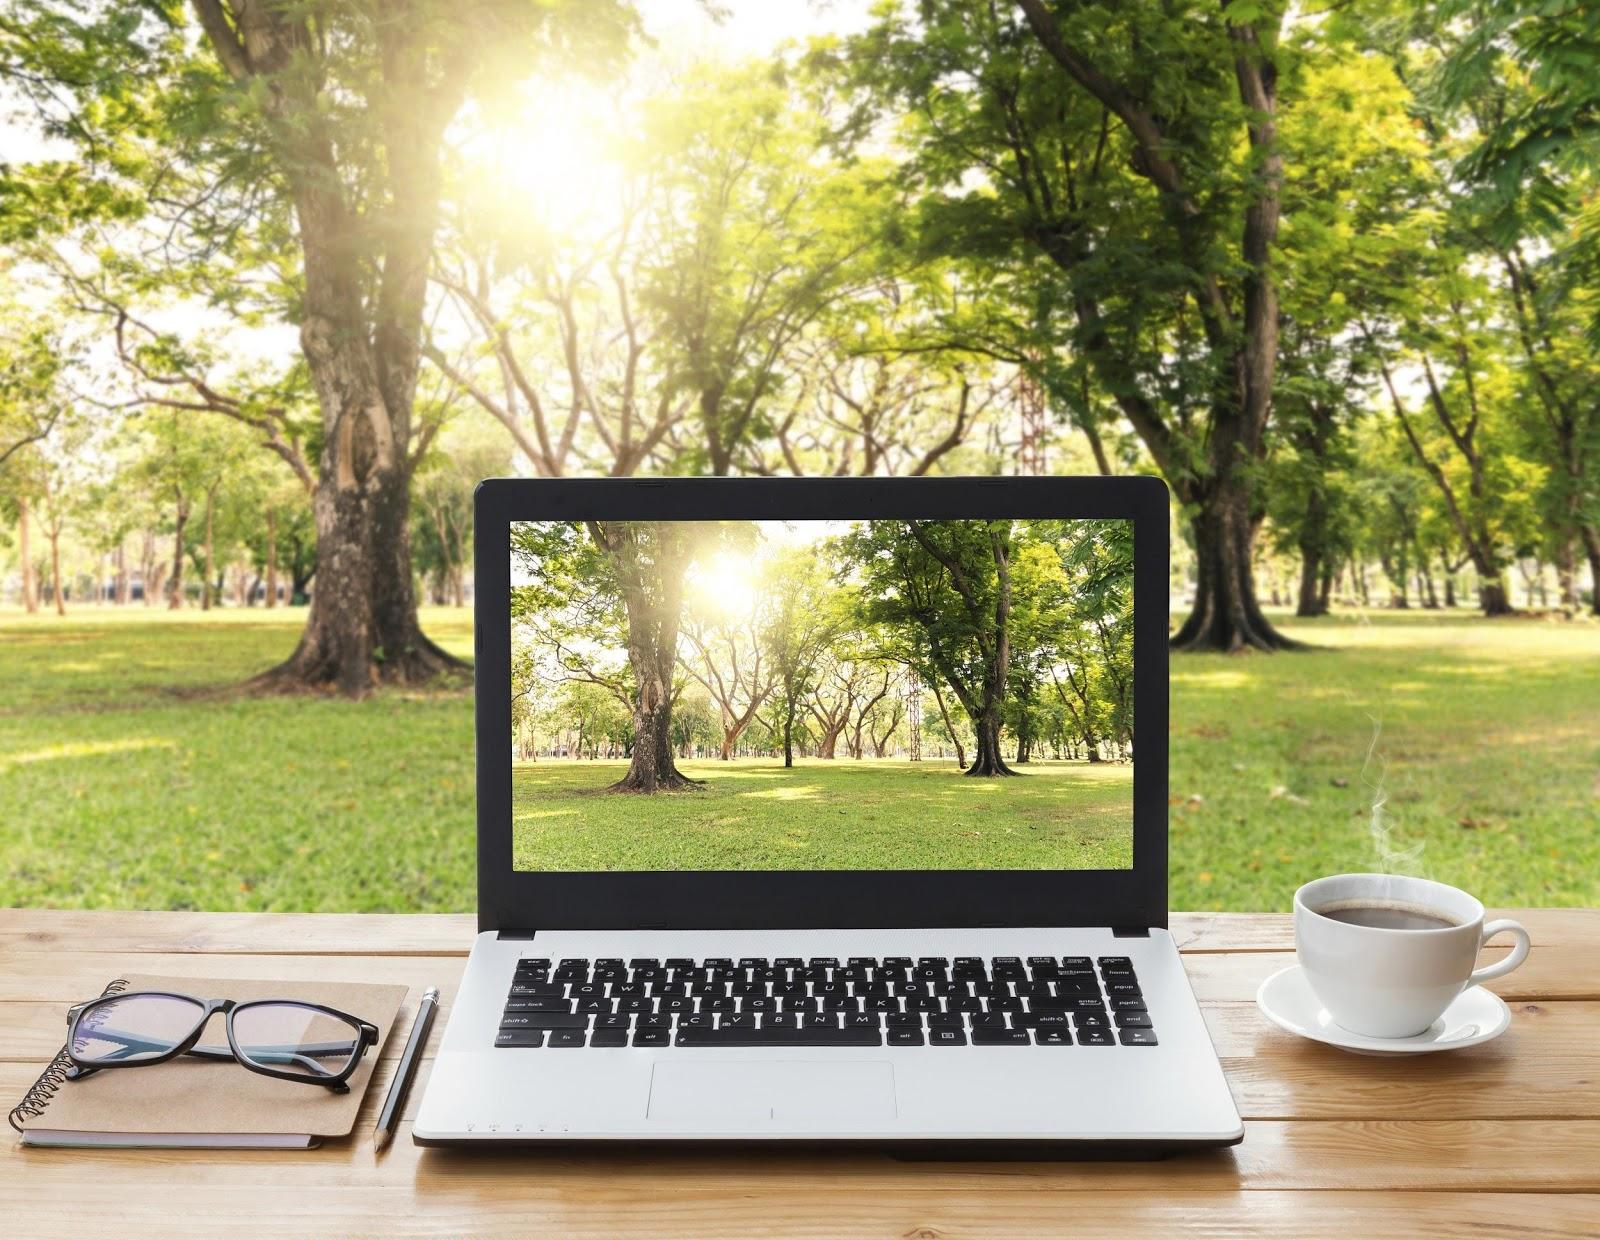 energy audit laptop in lush green environment